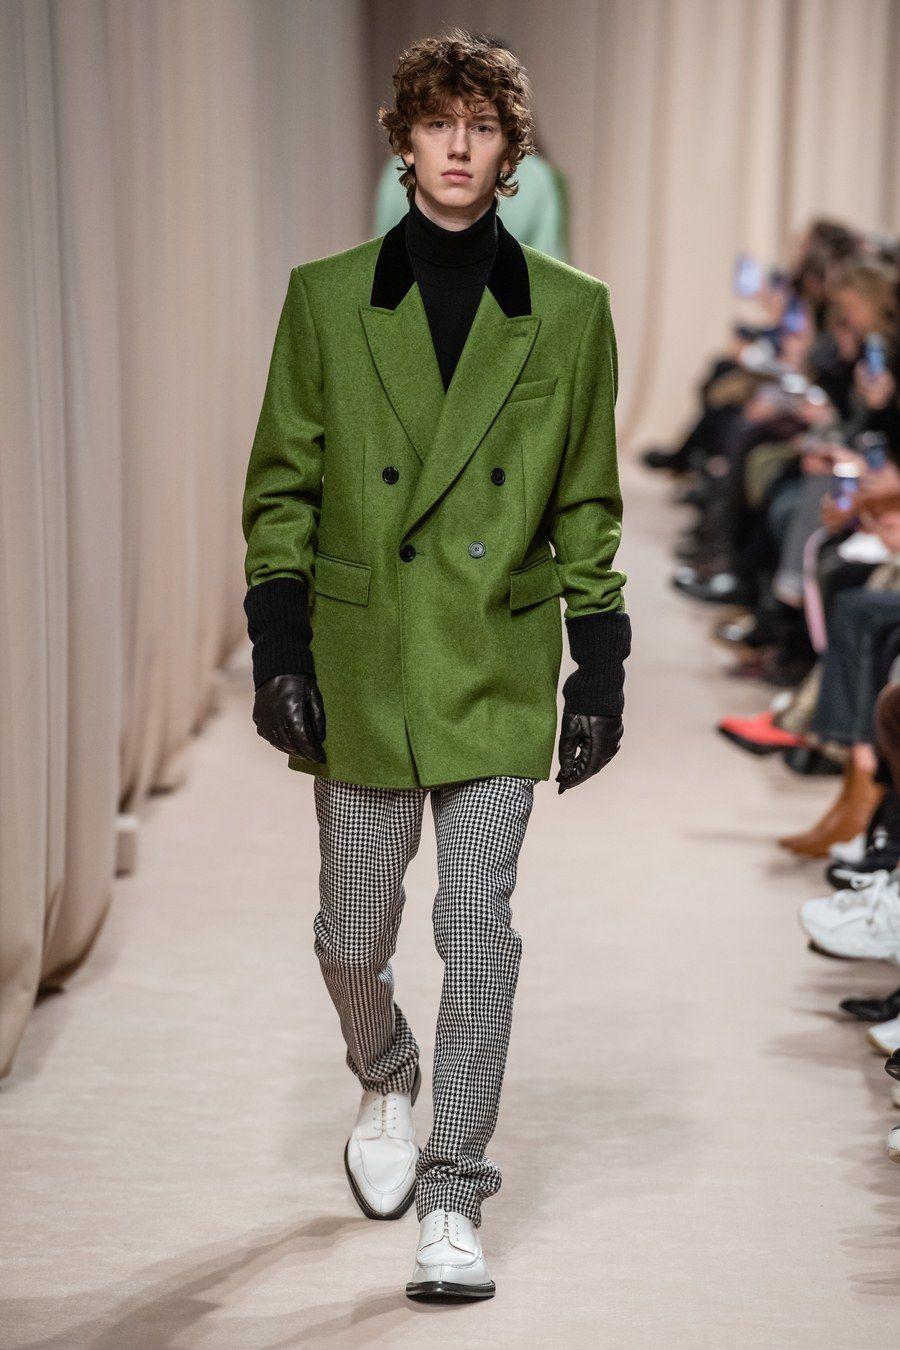 Ami Fall 2019 Menswear Fashion Show – fashion